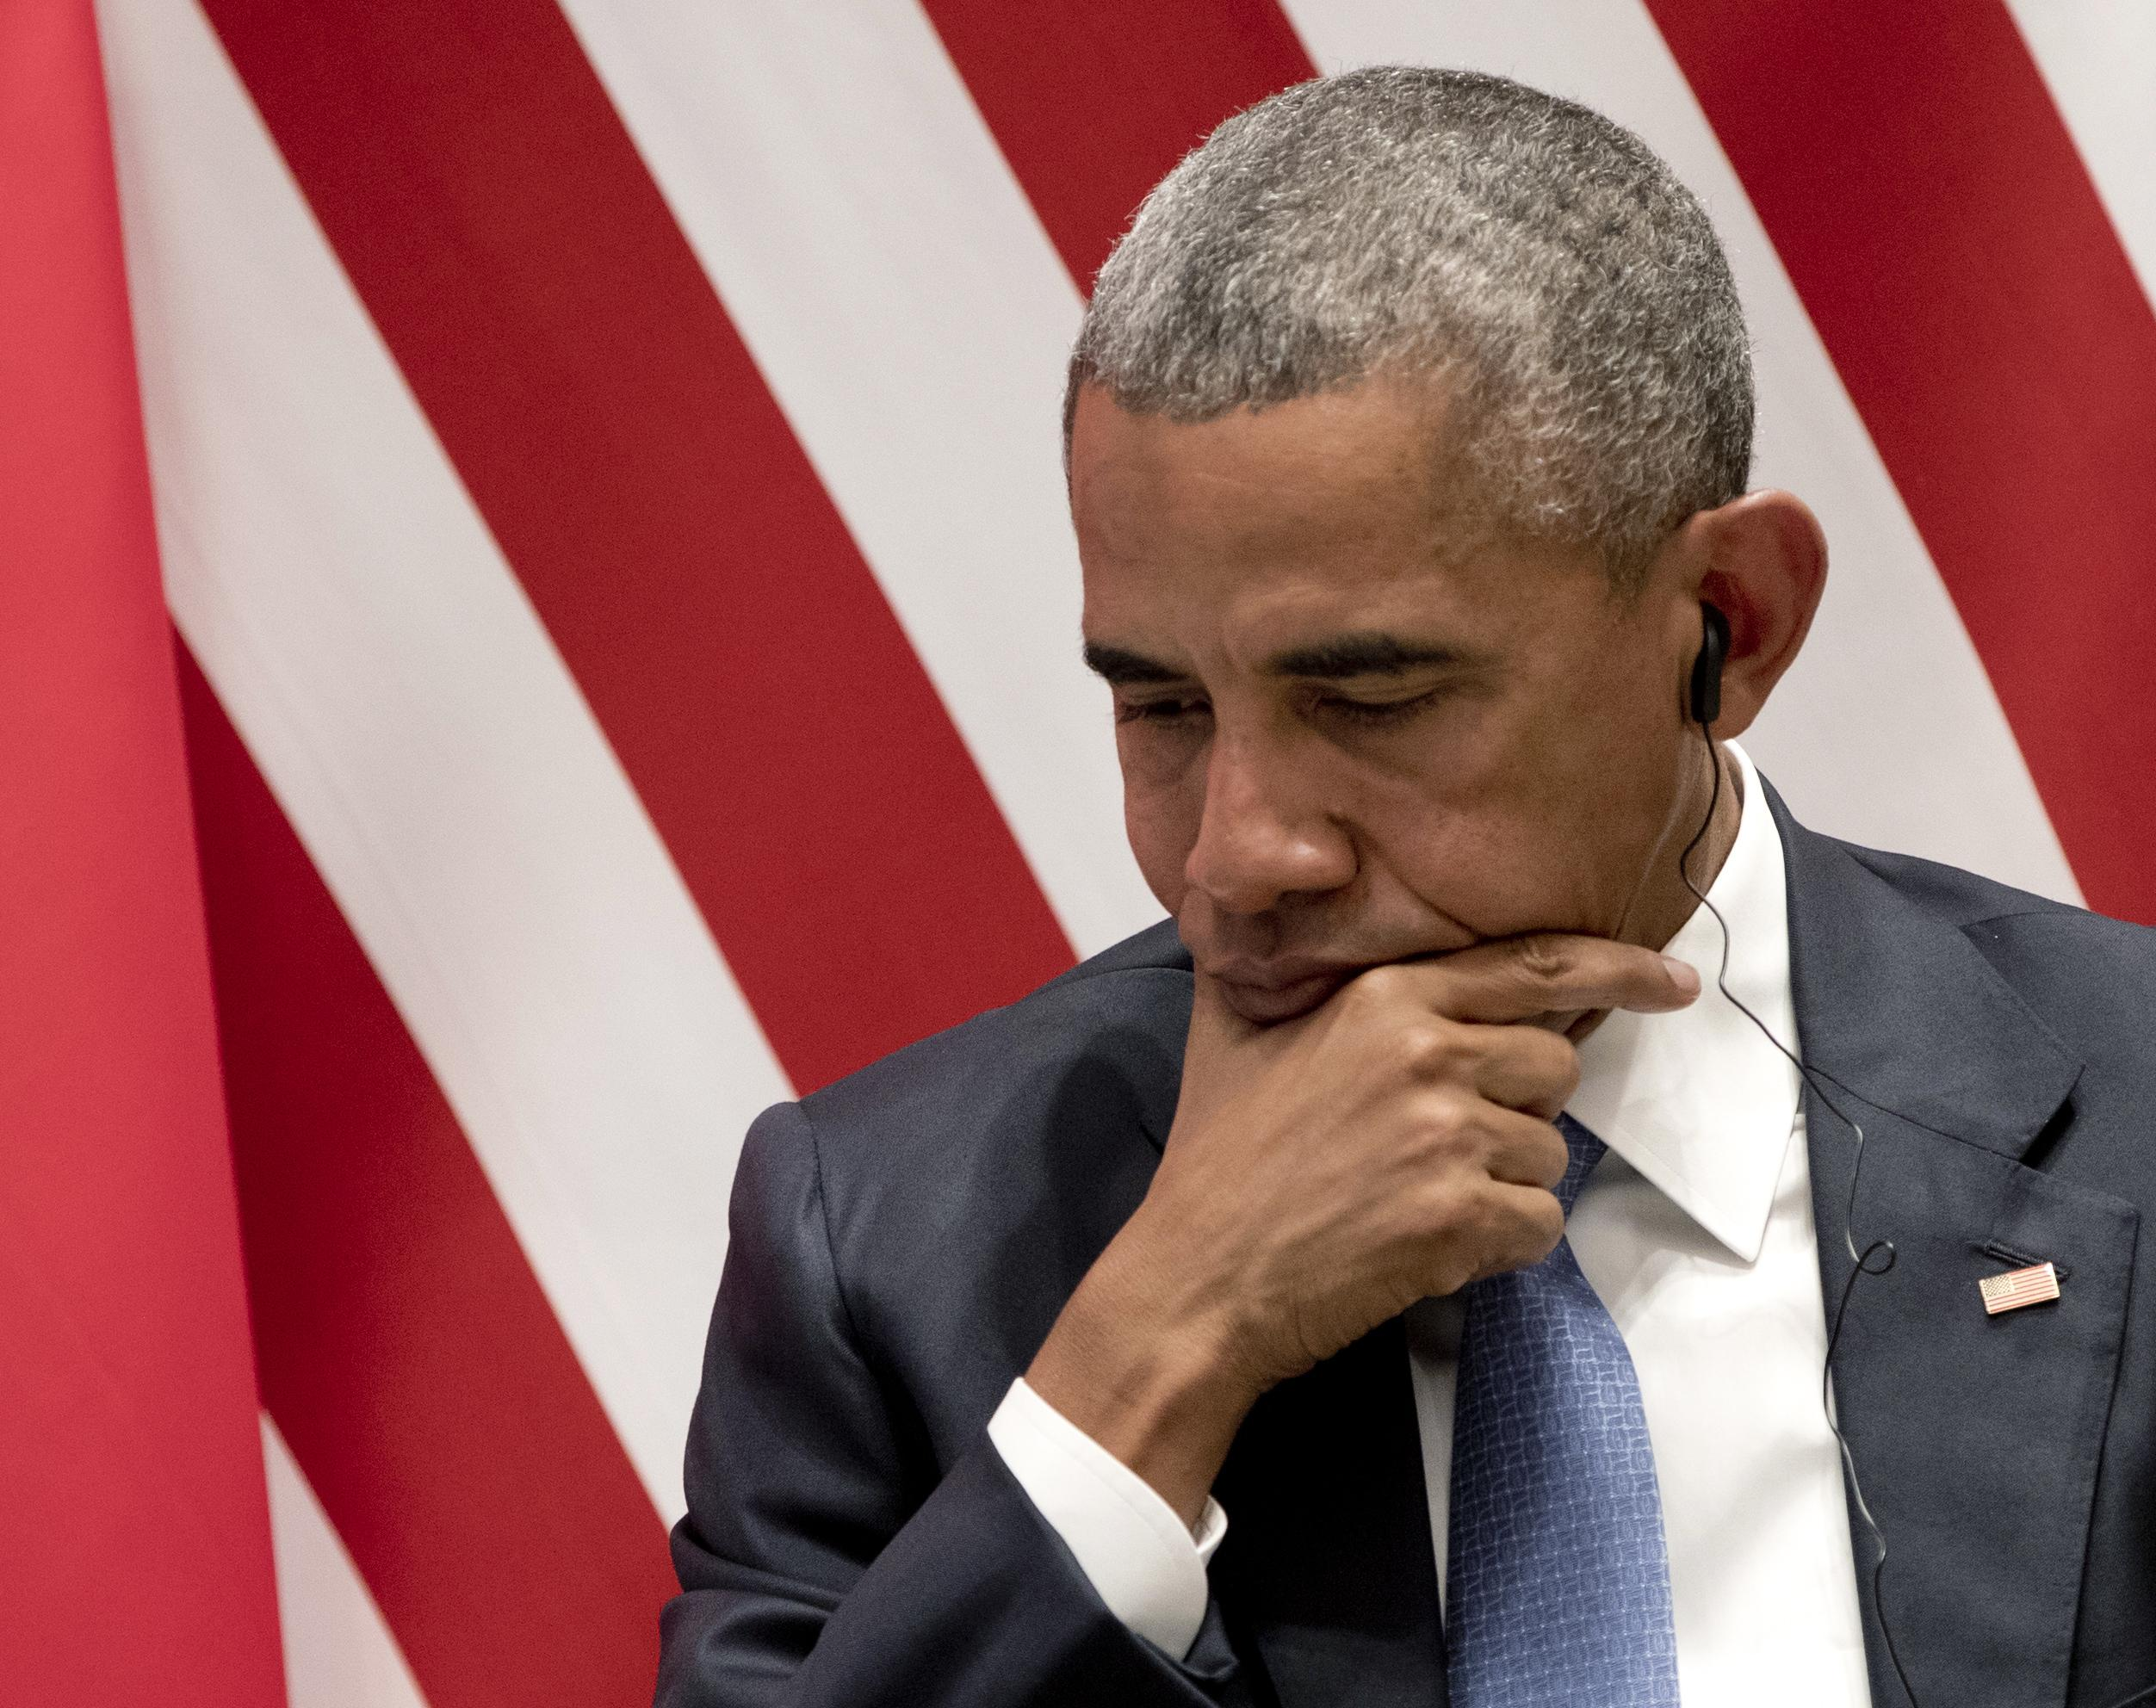 The Latest: Obama meets with Laotian president - Washington Times